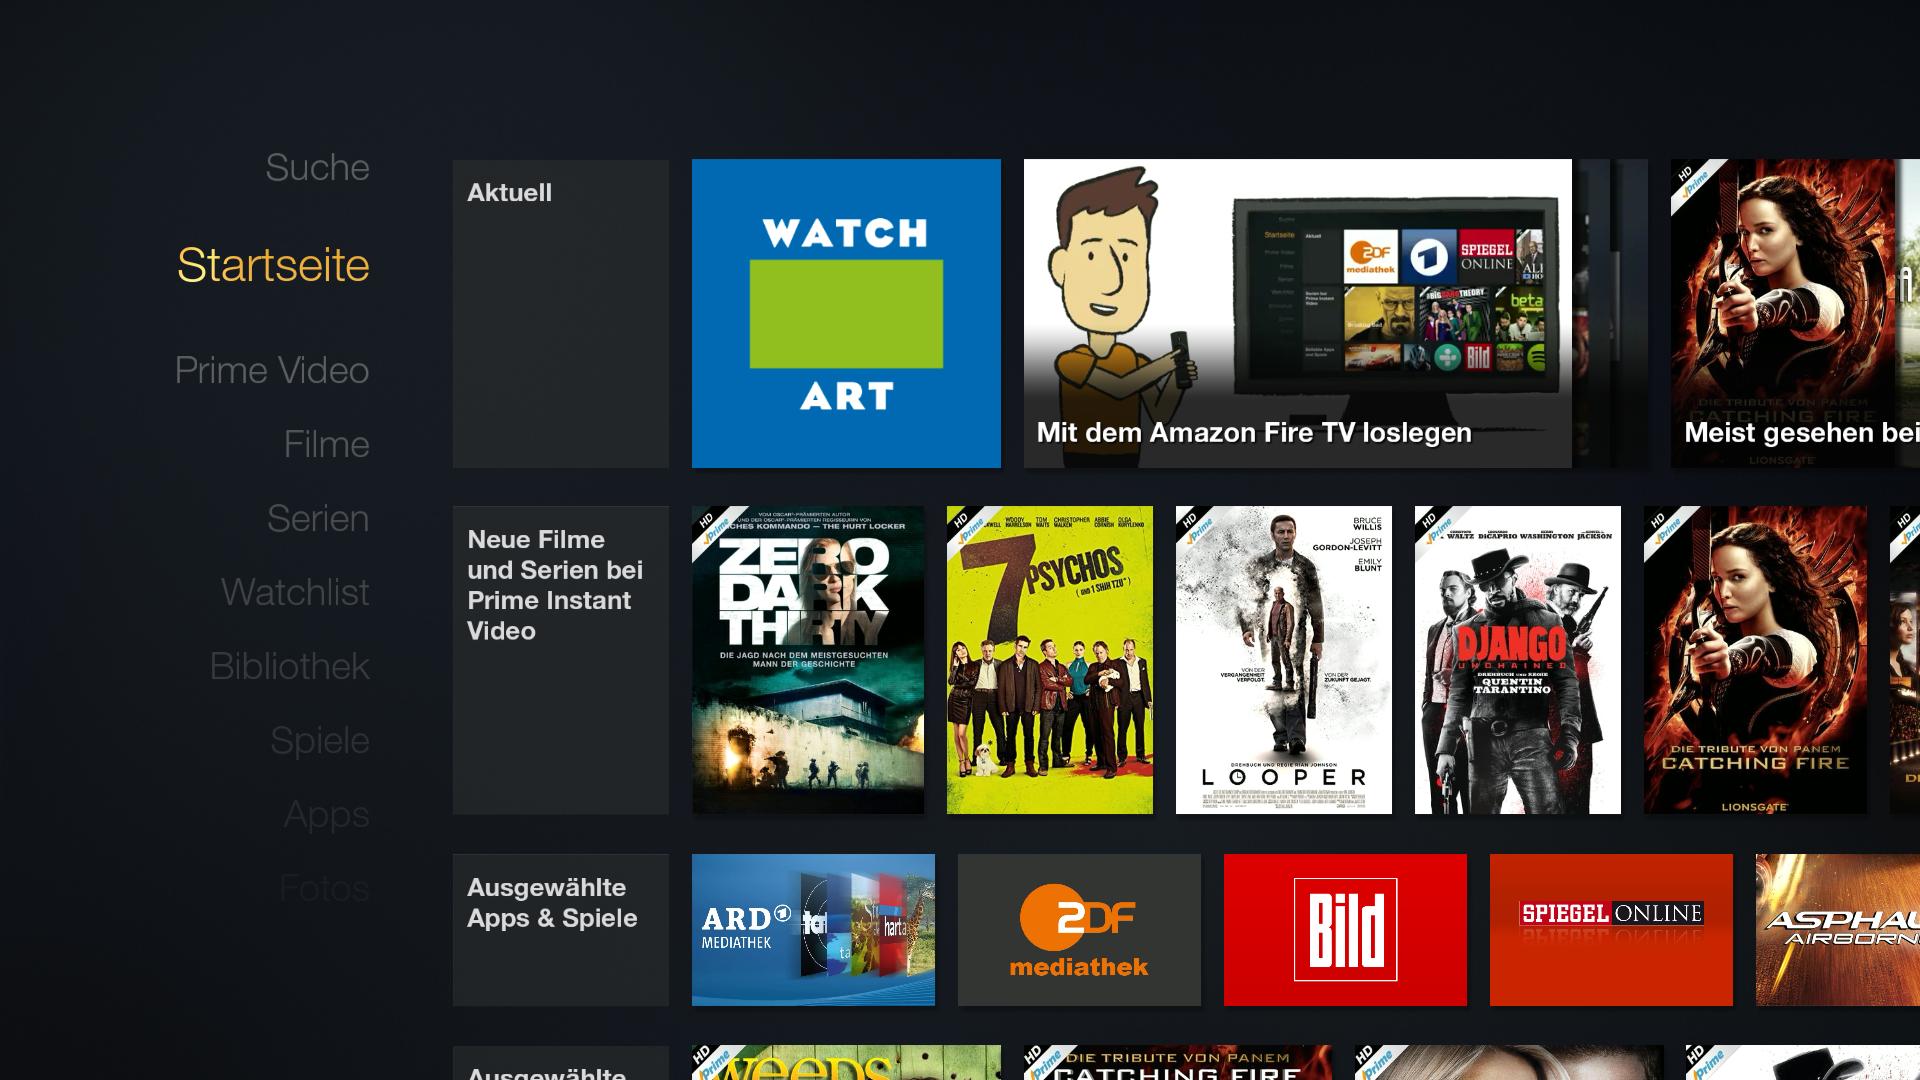 Workshop: Amazons Fire TV wird zur Multimedia-Zentrale - Startbildschirm des Fire TV mit installierter Ikono-TV-App (Screenshot: Golem.de)